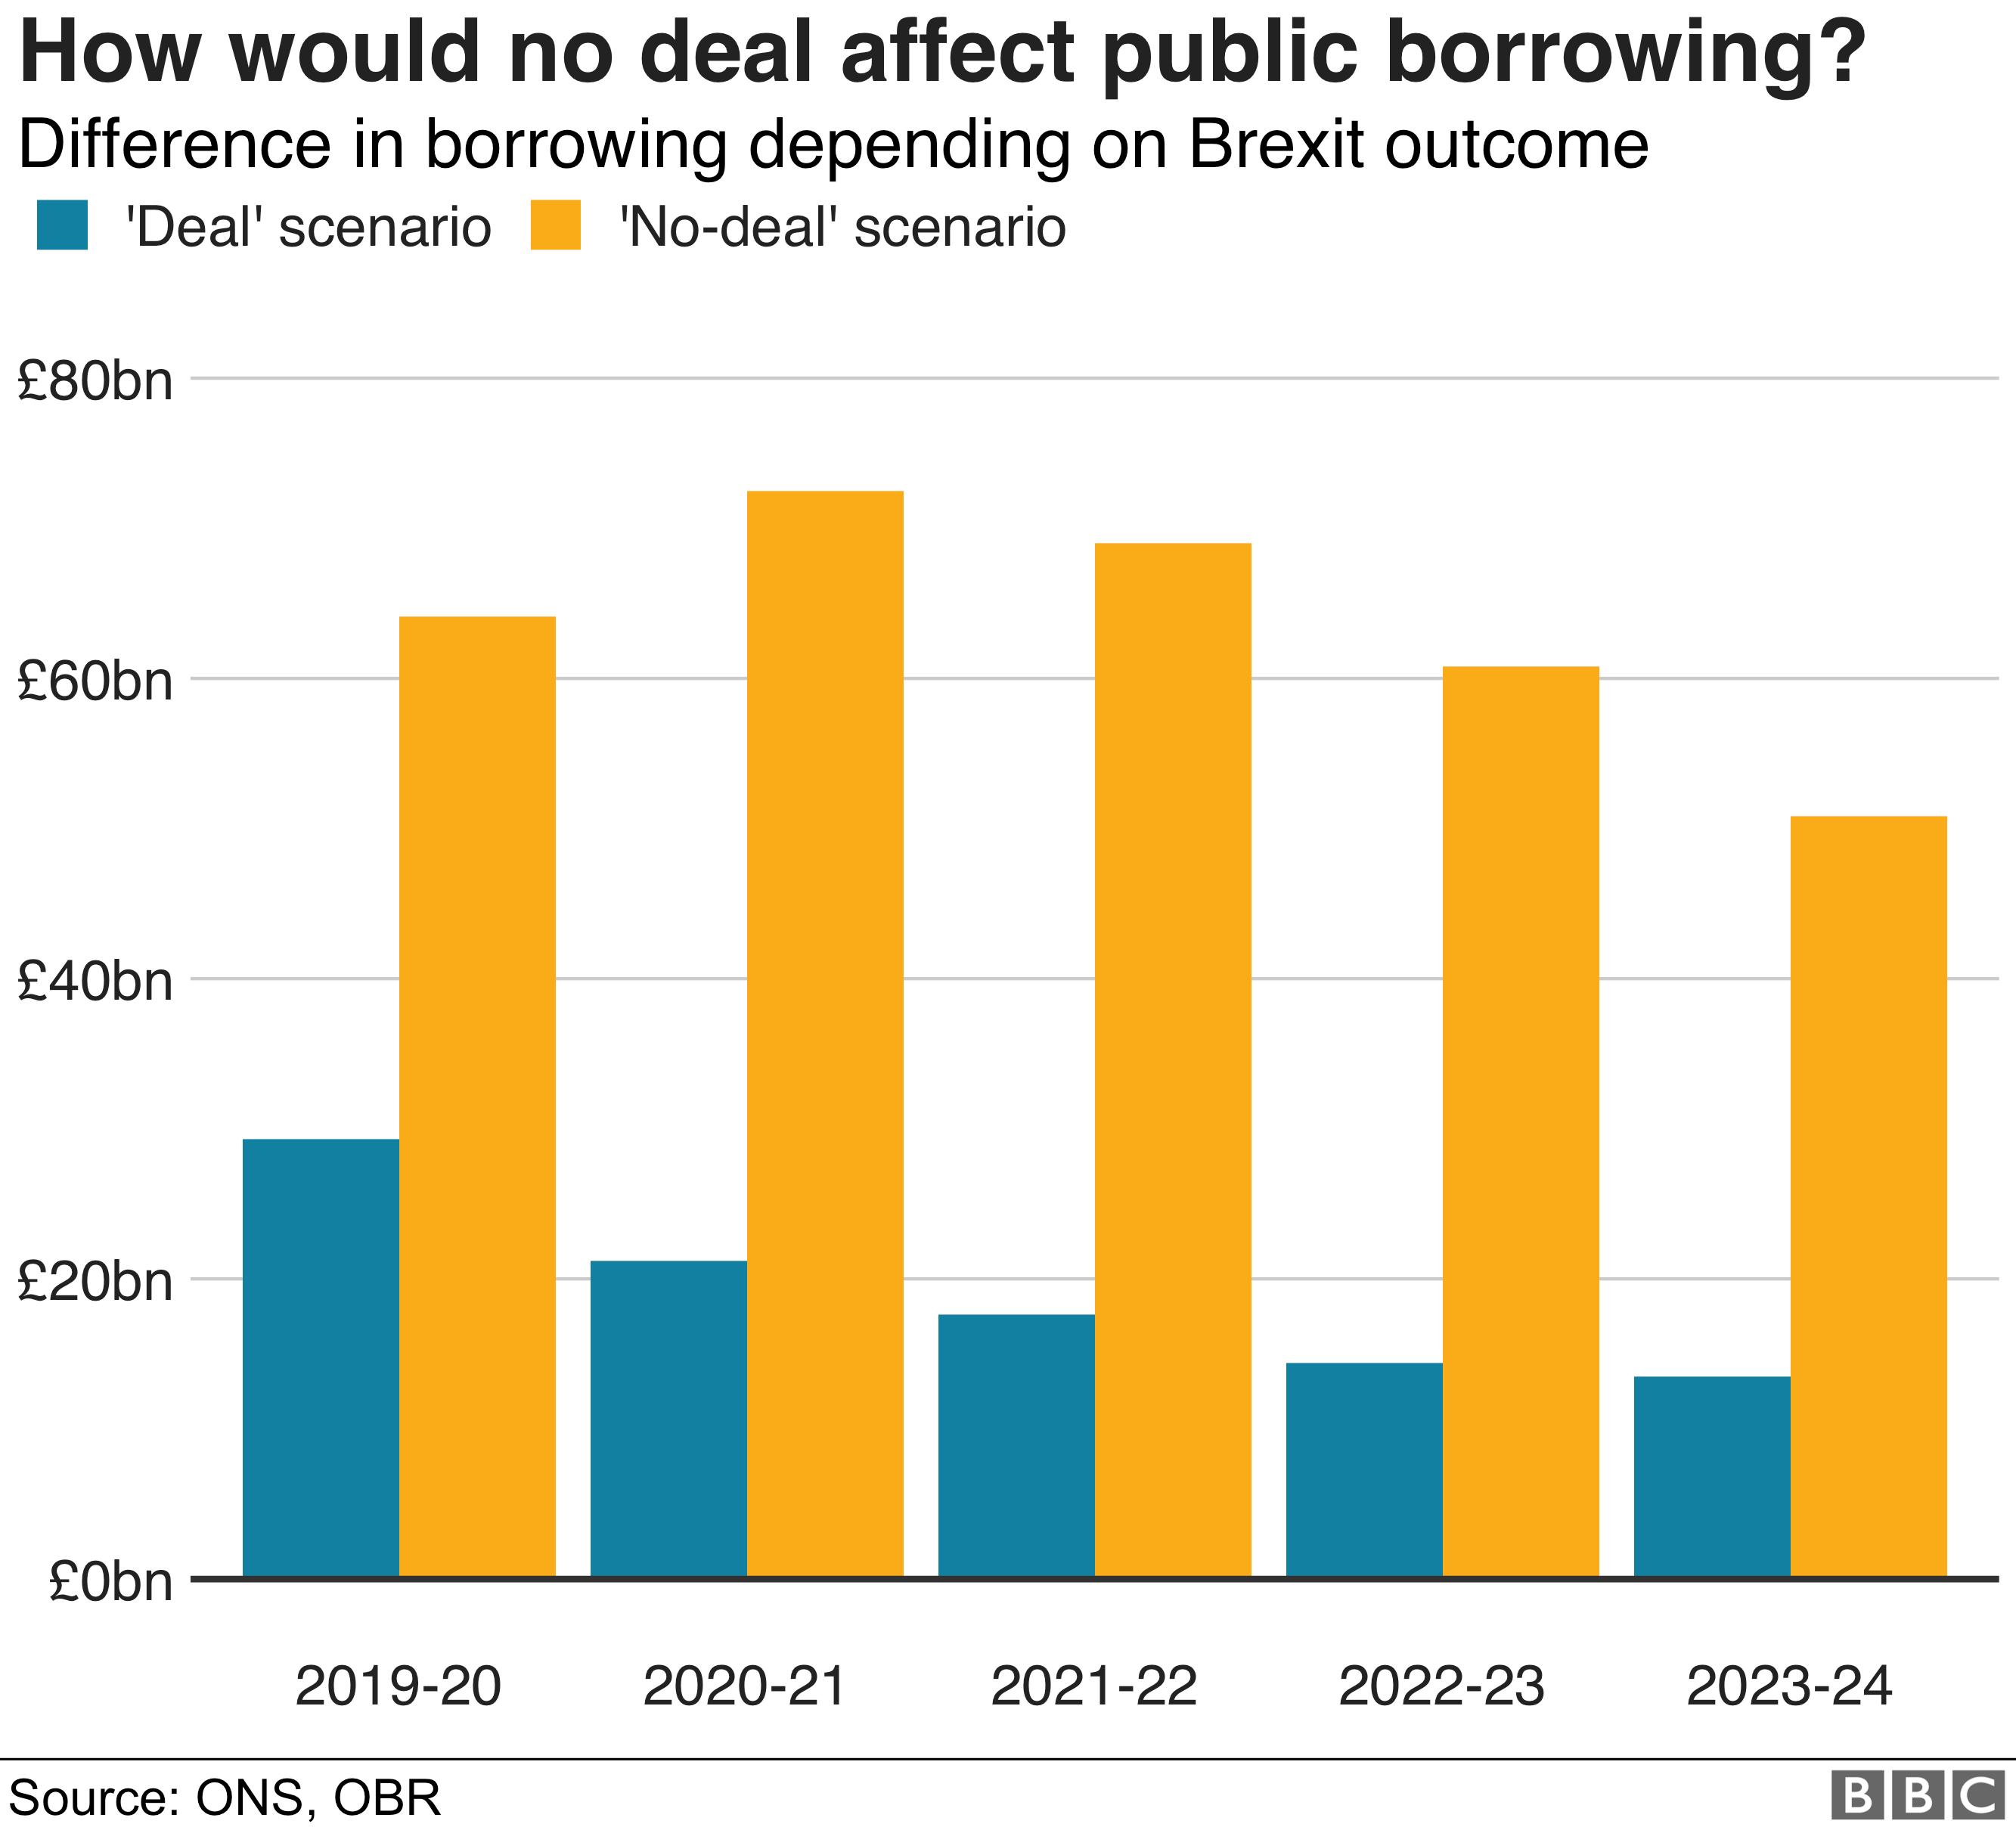 No-deal effect on public borrowing